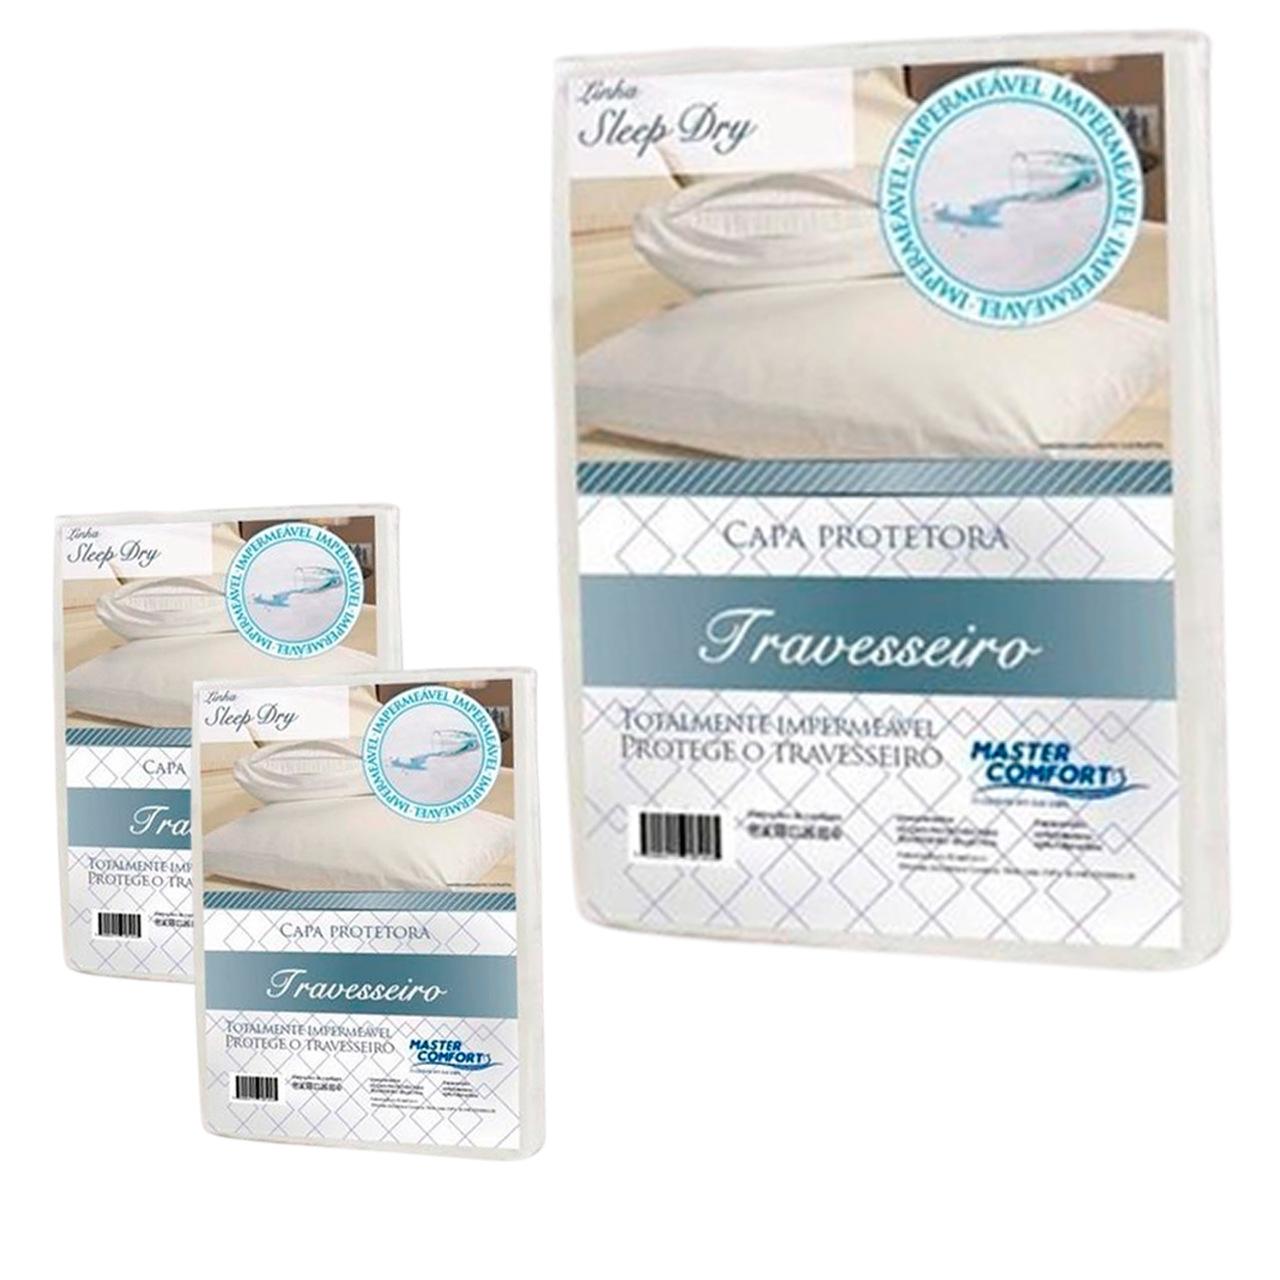 KIT 3 Capas Protetora Impermeável de Travesseiro Sleep Dry